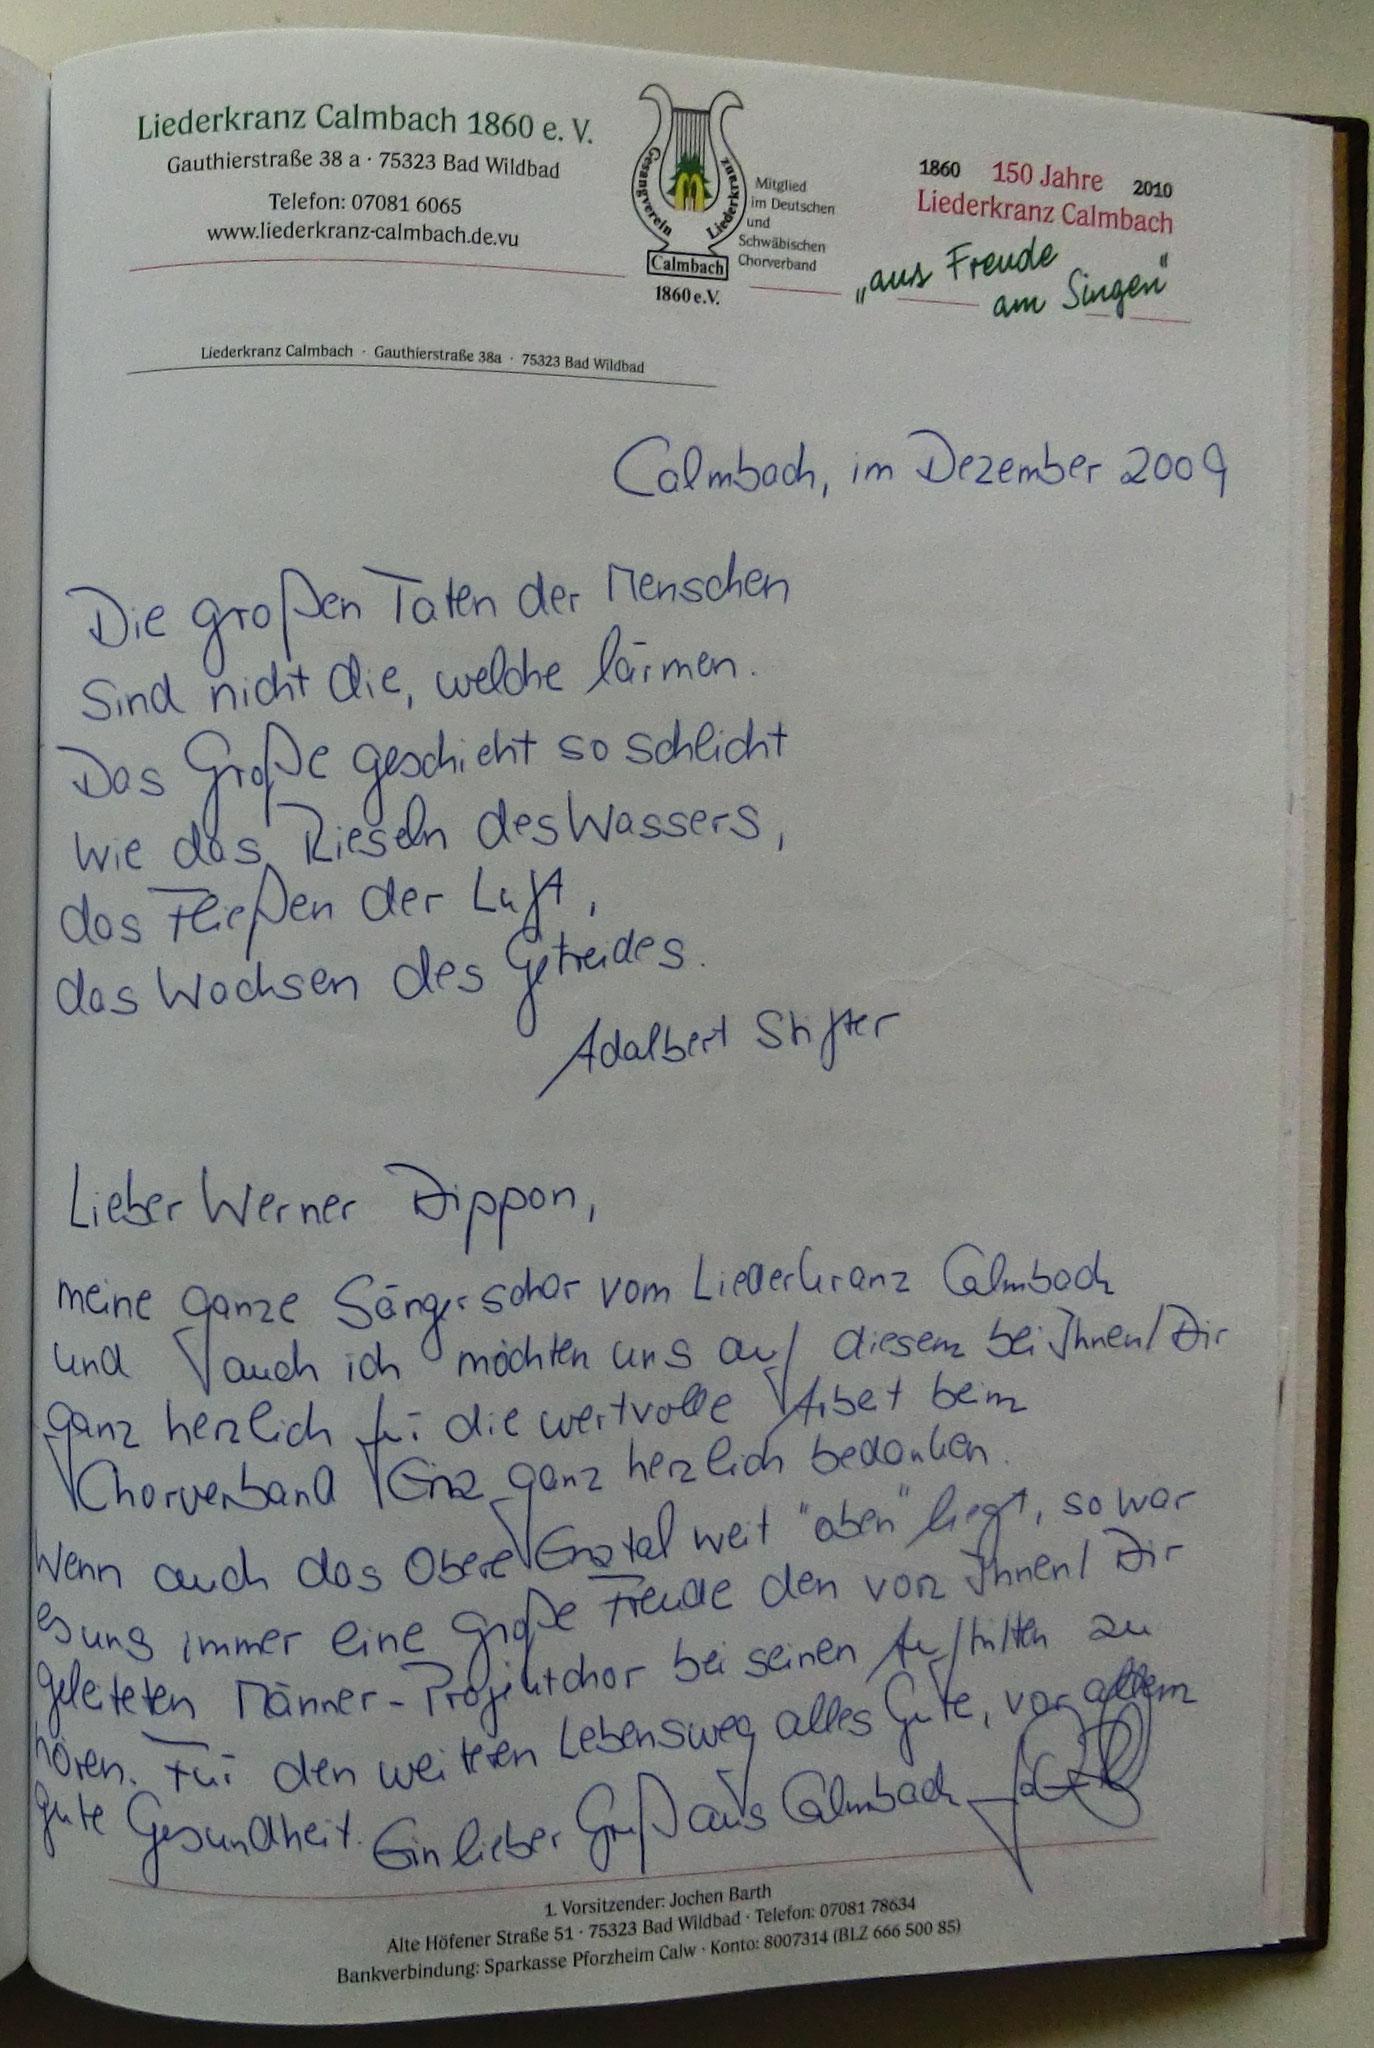 Liederkranz Calmbach